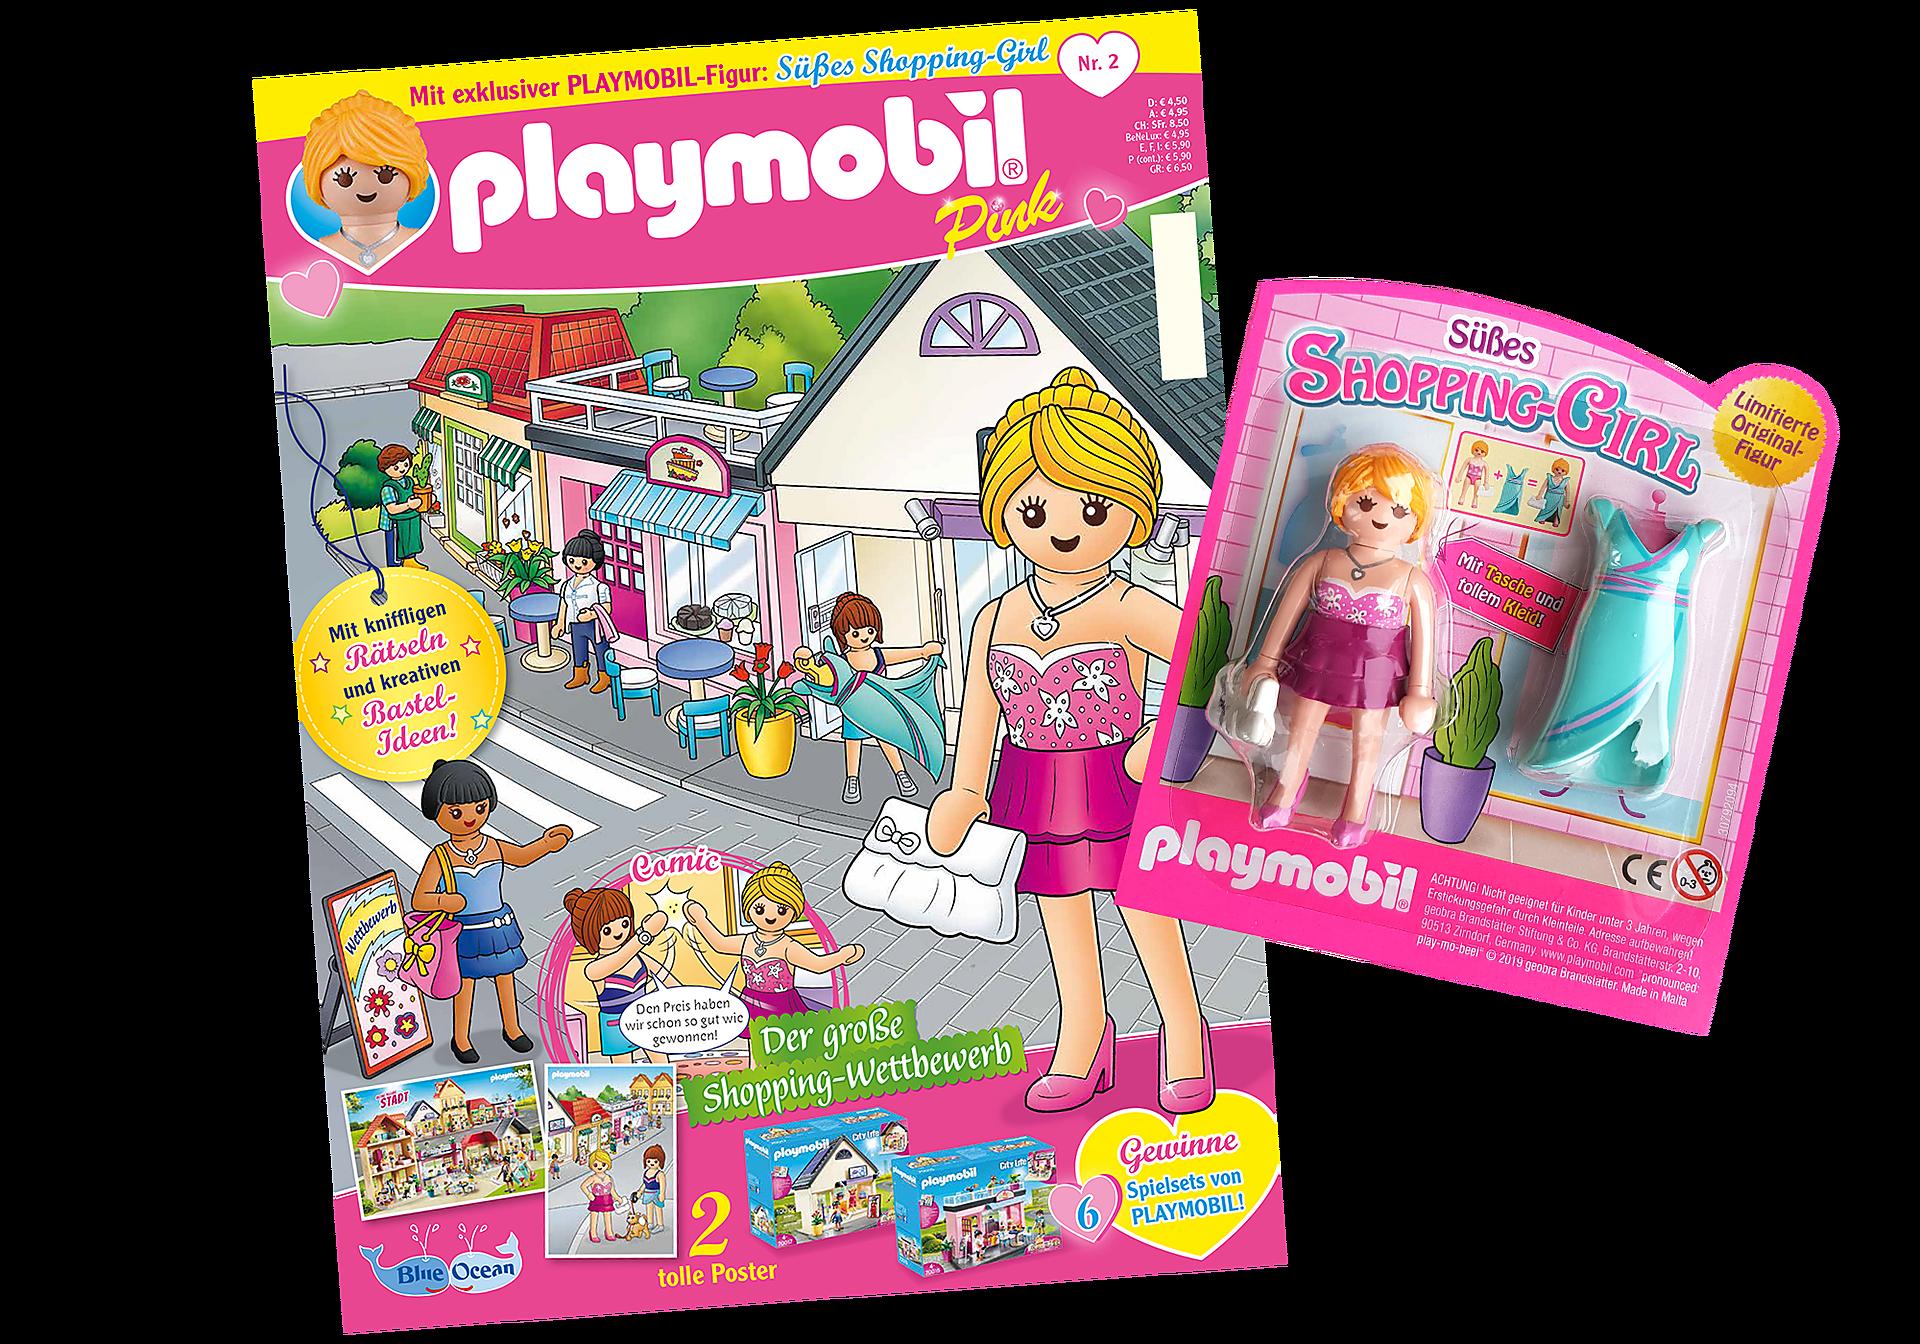 80621 PLAYMOBIL-Magazin Pink 2/2019 (Heft 42) zoom image1